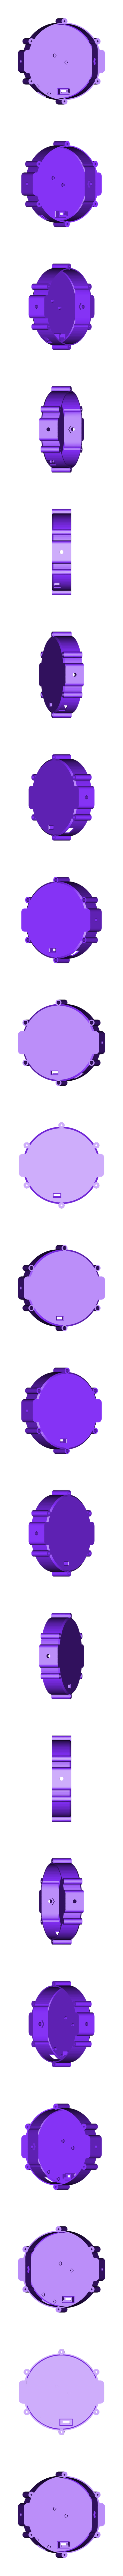 handle_circle.stl Download free STL file Guardian Shield+ Zelda Breath of the Wild • 3D print object, Adafruit